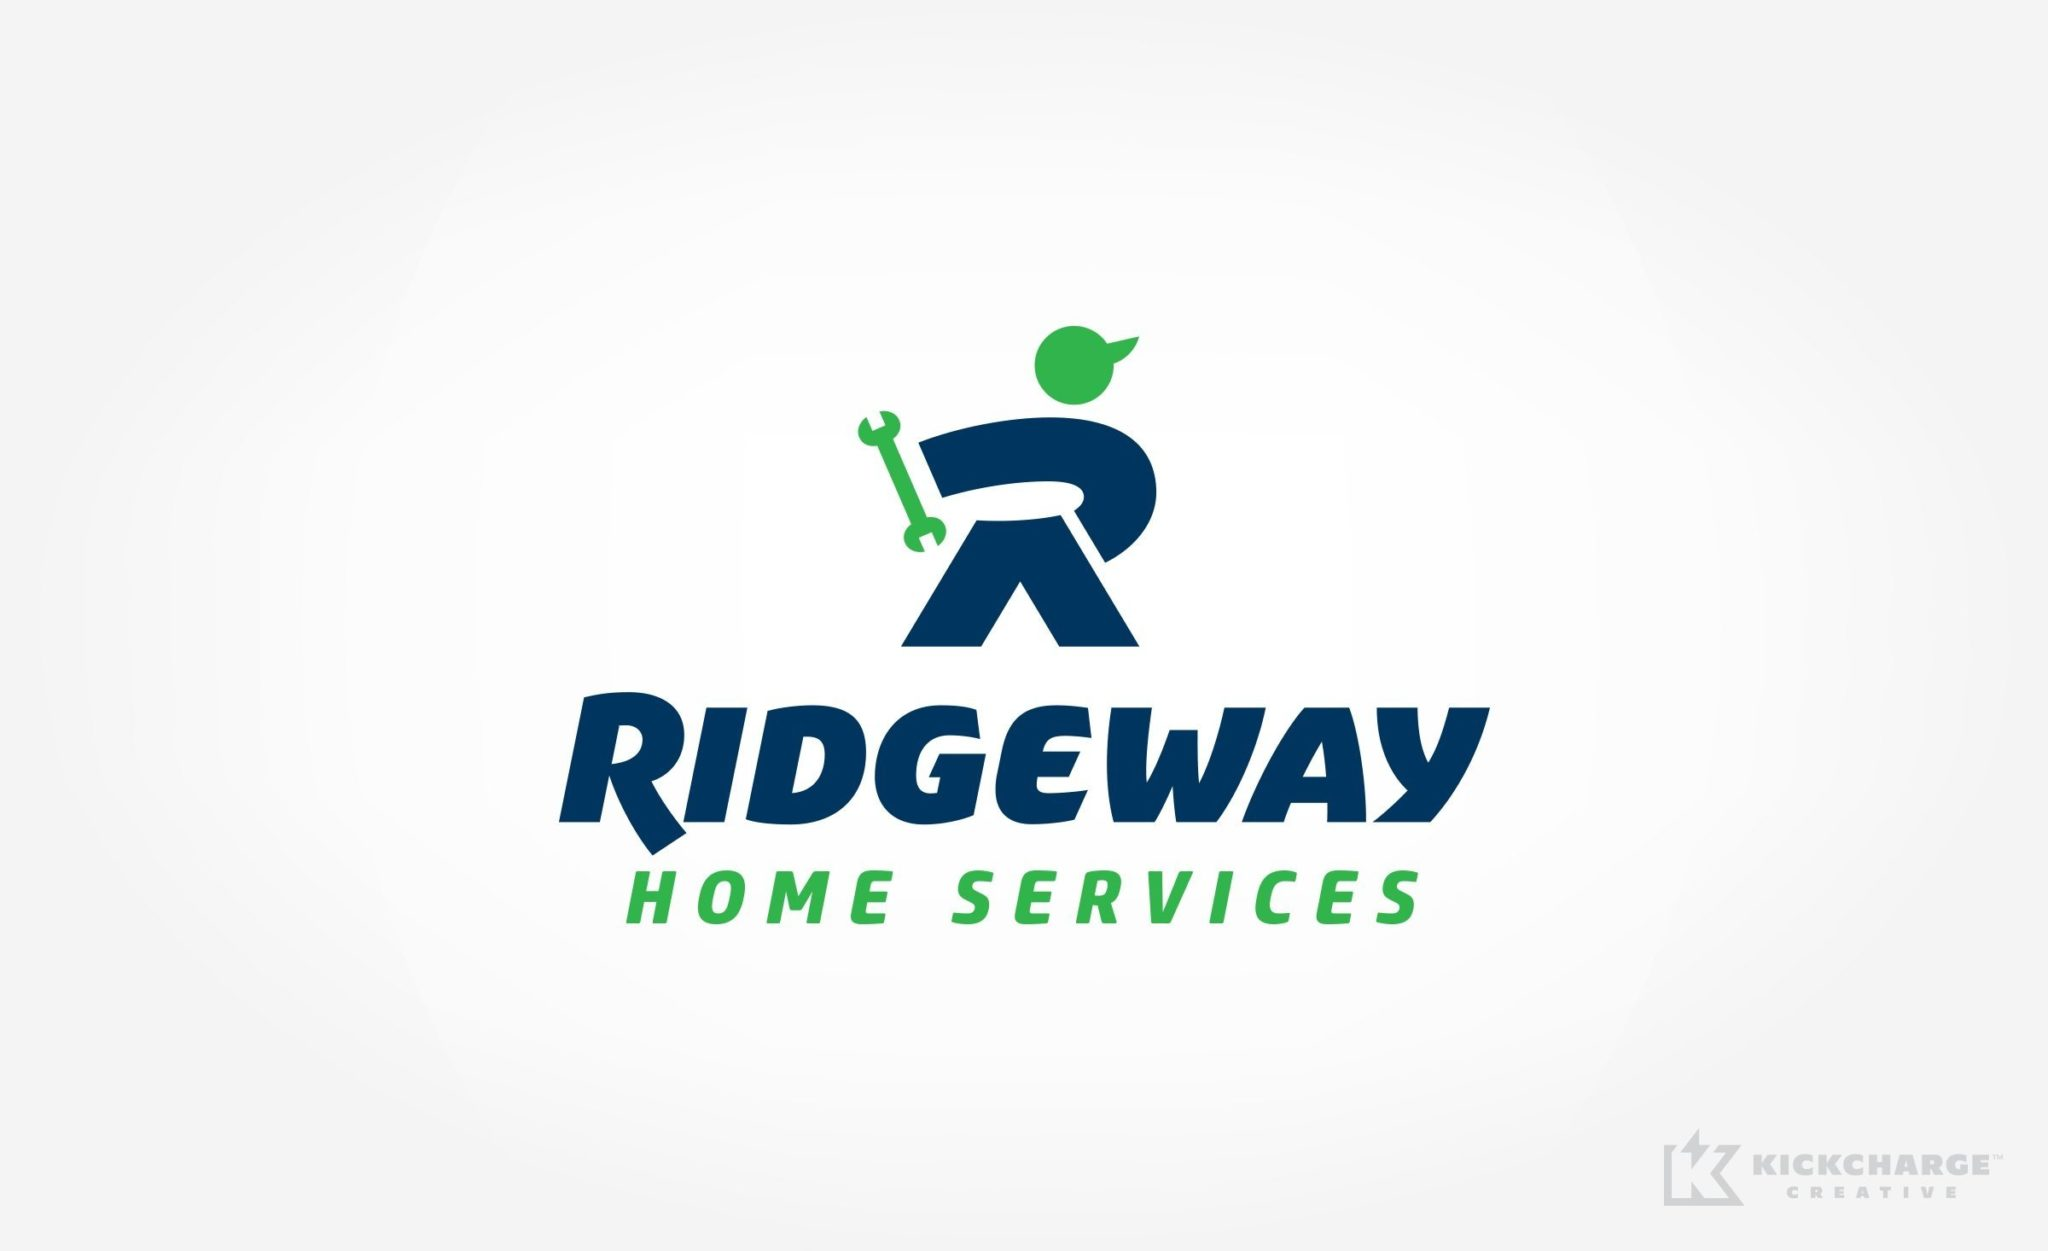 Ridgeway Home Services